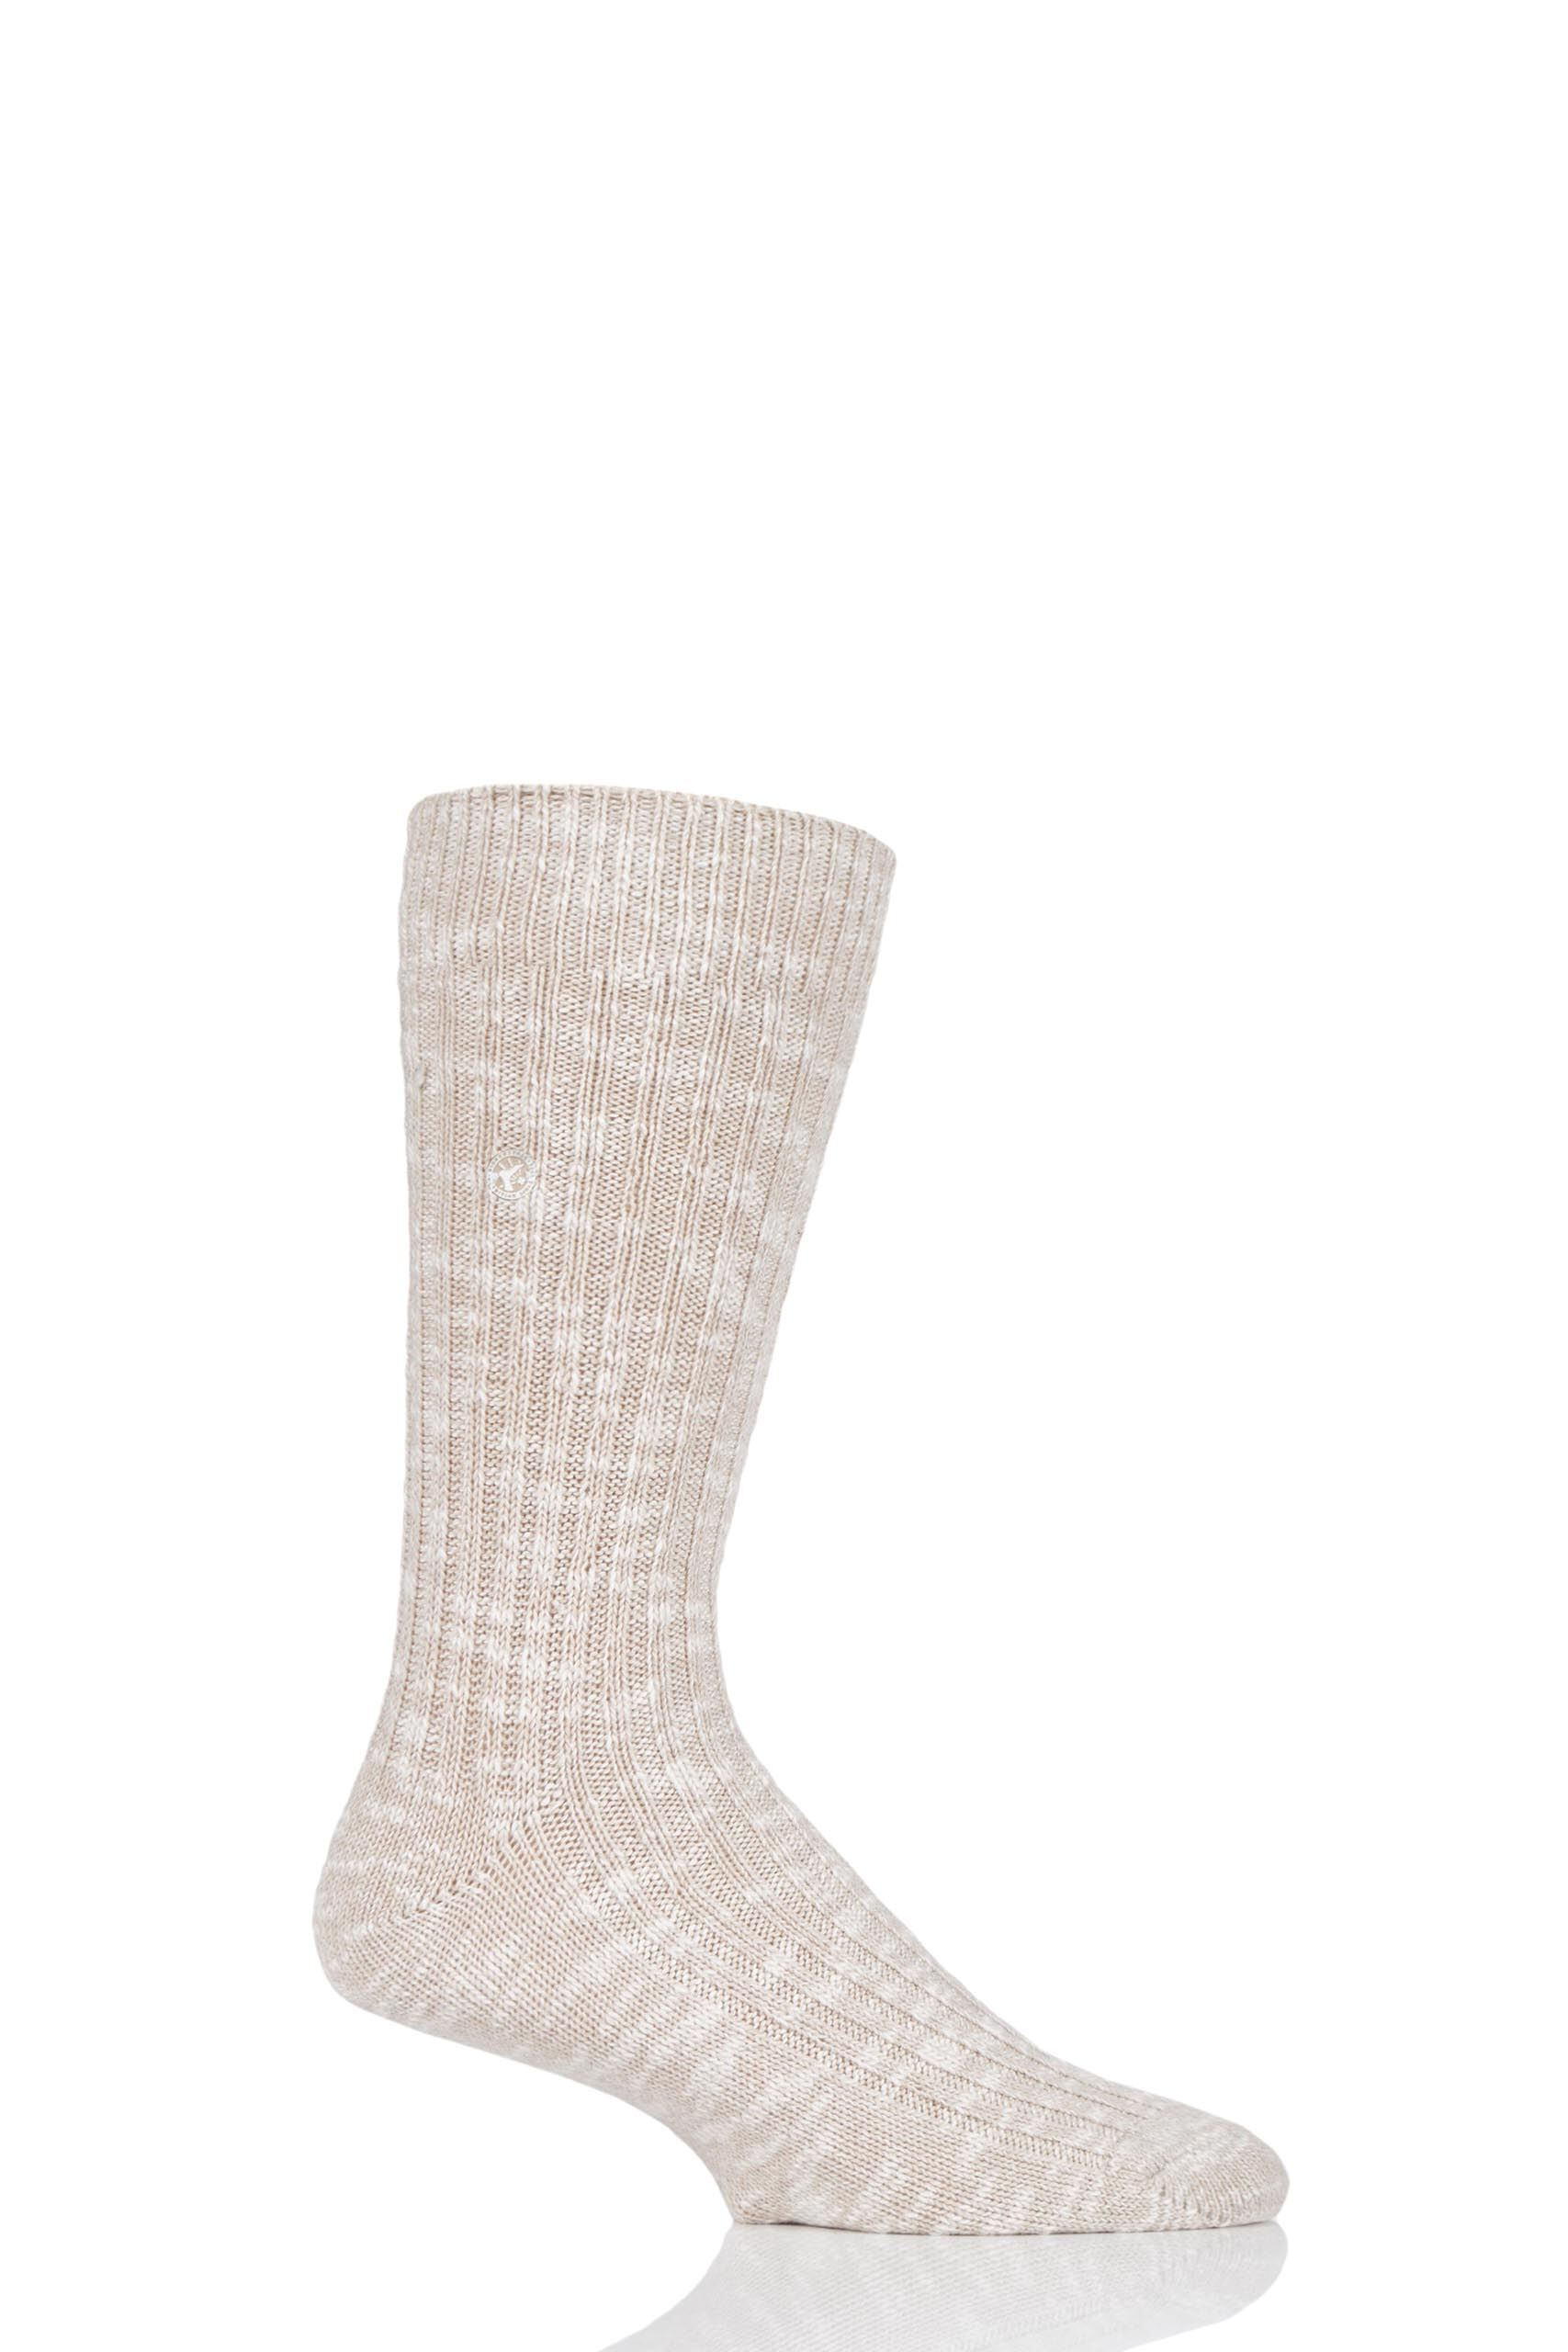 Image of 1 Pair Beige Cotton Slub Thick Ribbed Socks Men's 10.5-12 Mens - Birkenstock